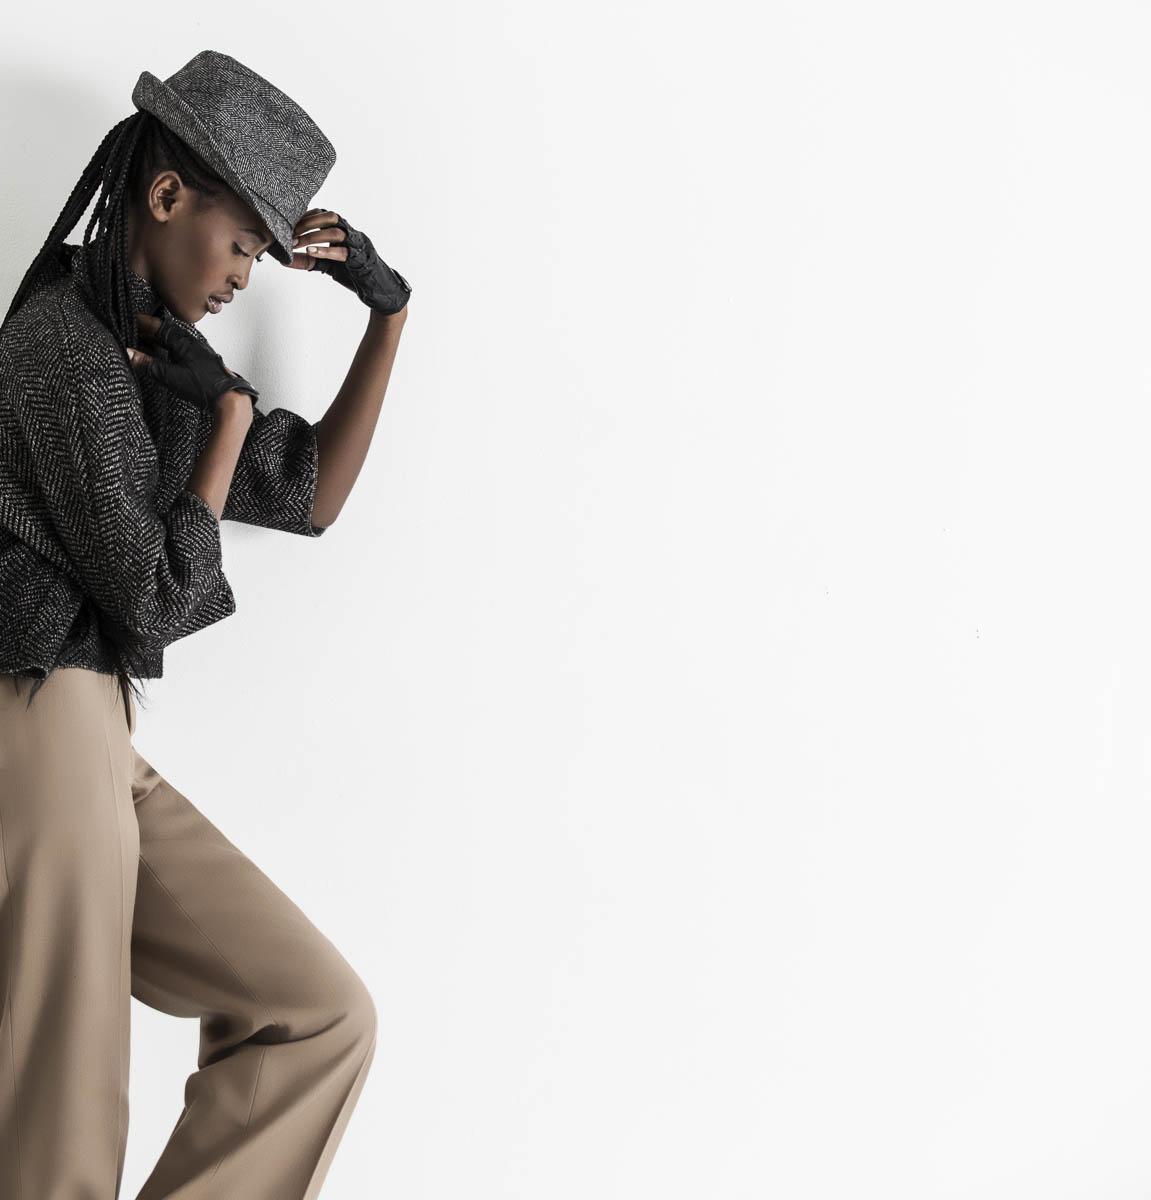 Zara Bedel by James Hickey Los Angeles Fashion Photographer.